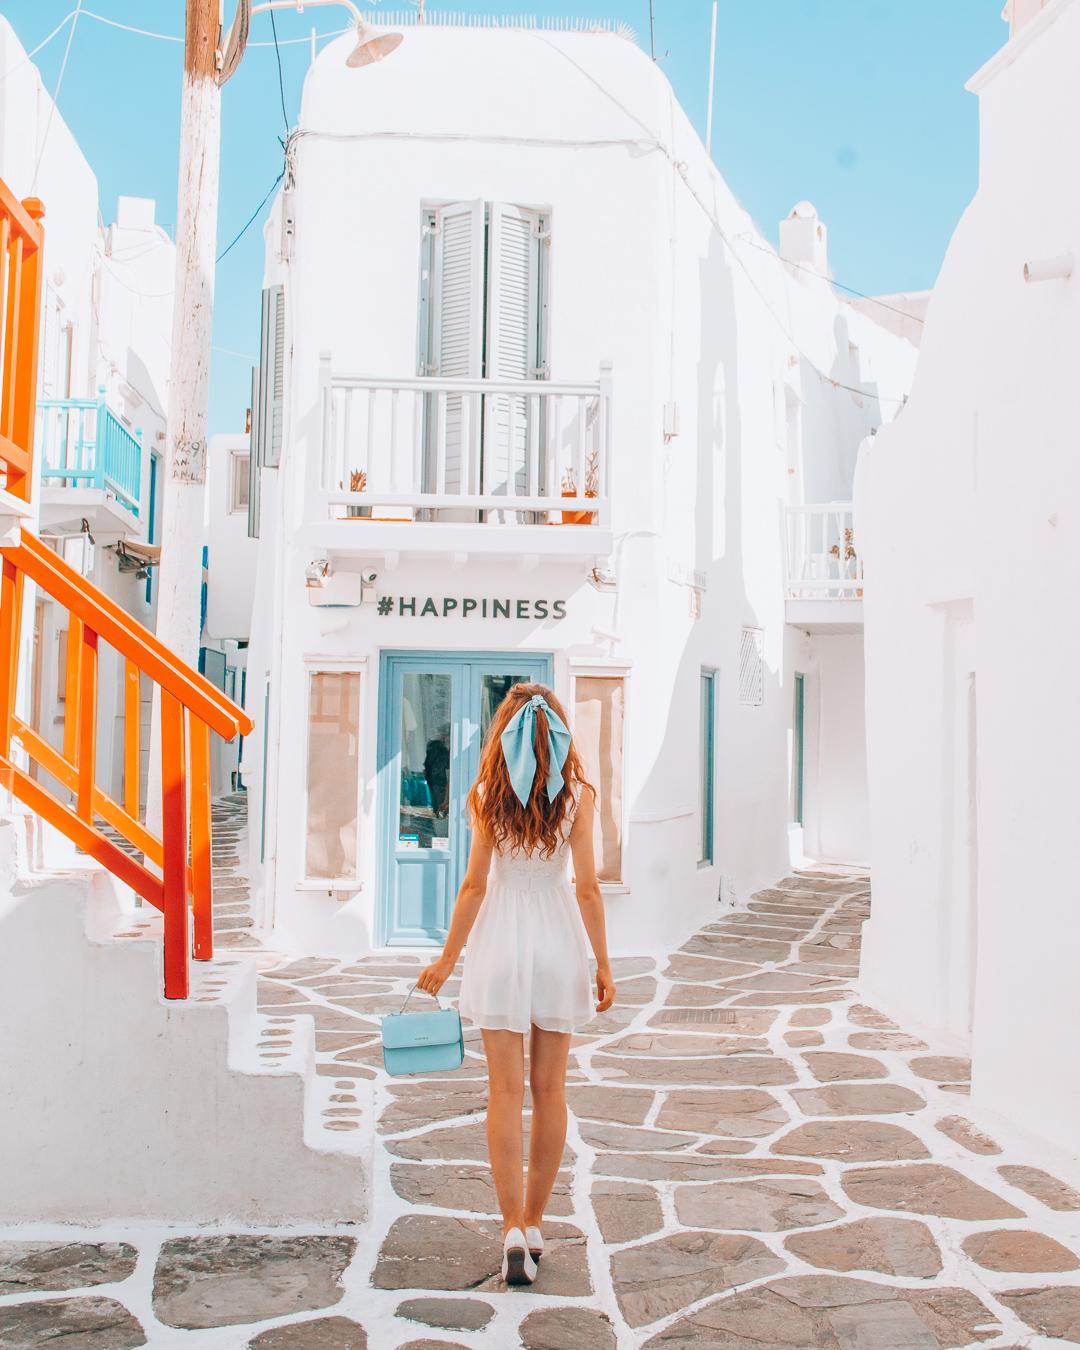 Happiness store in Mykonos